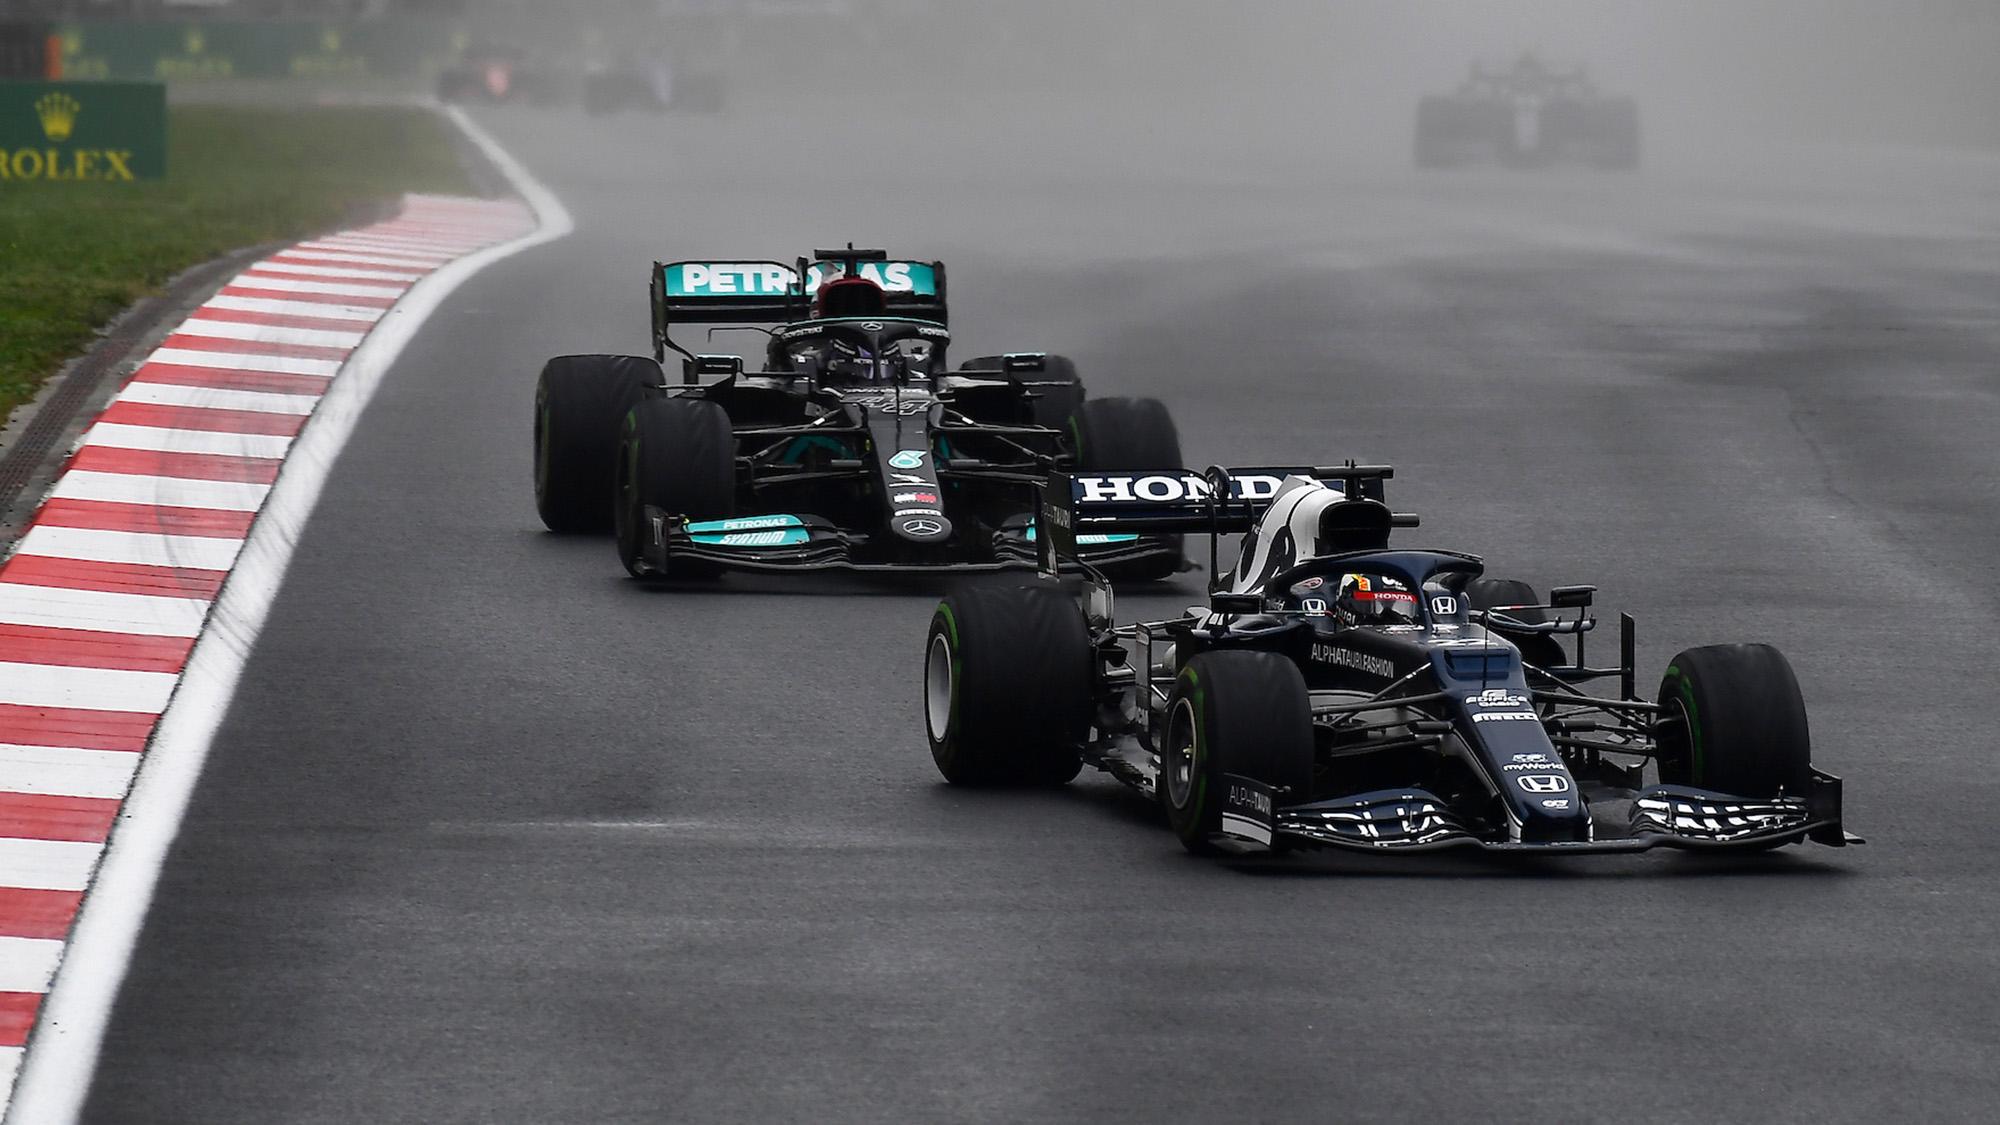 Yuki Tsunoda ahead of Lewis Hamilton at the 2021 Turkish Grand Prix